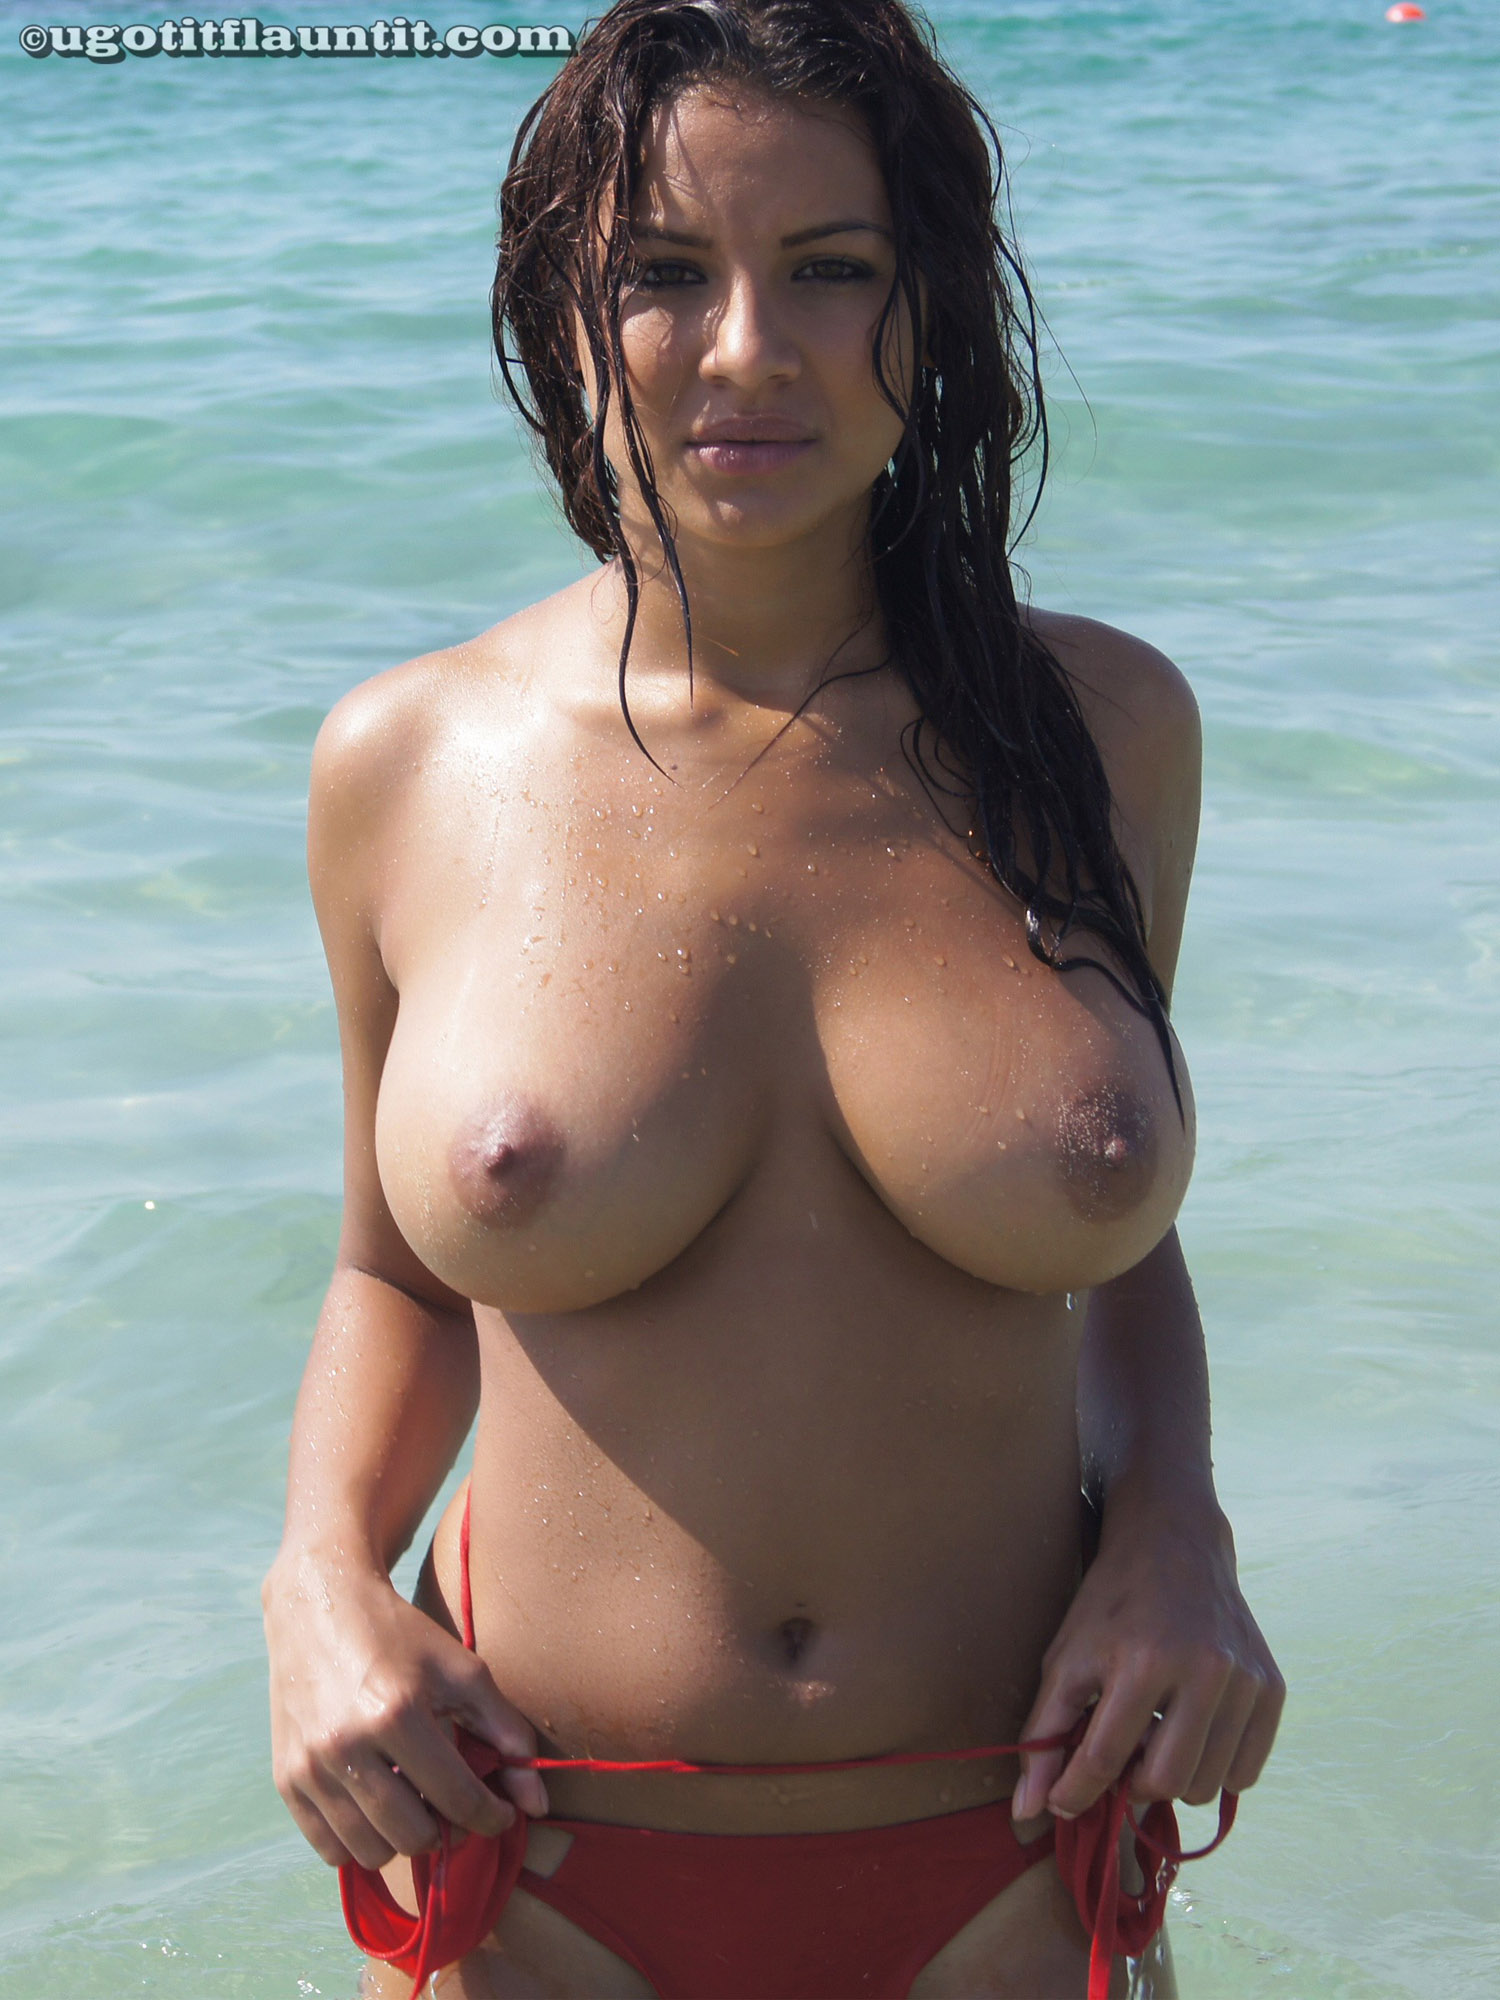 Whoa u got big boobs